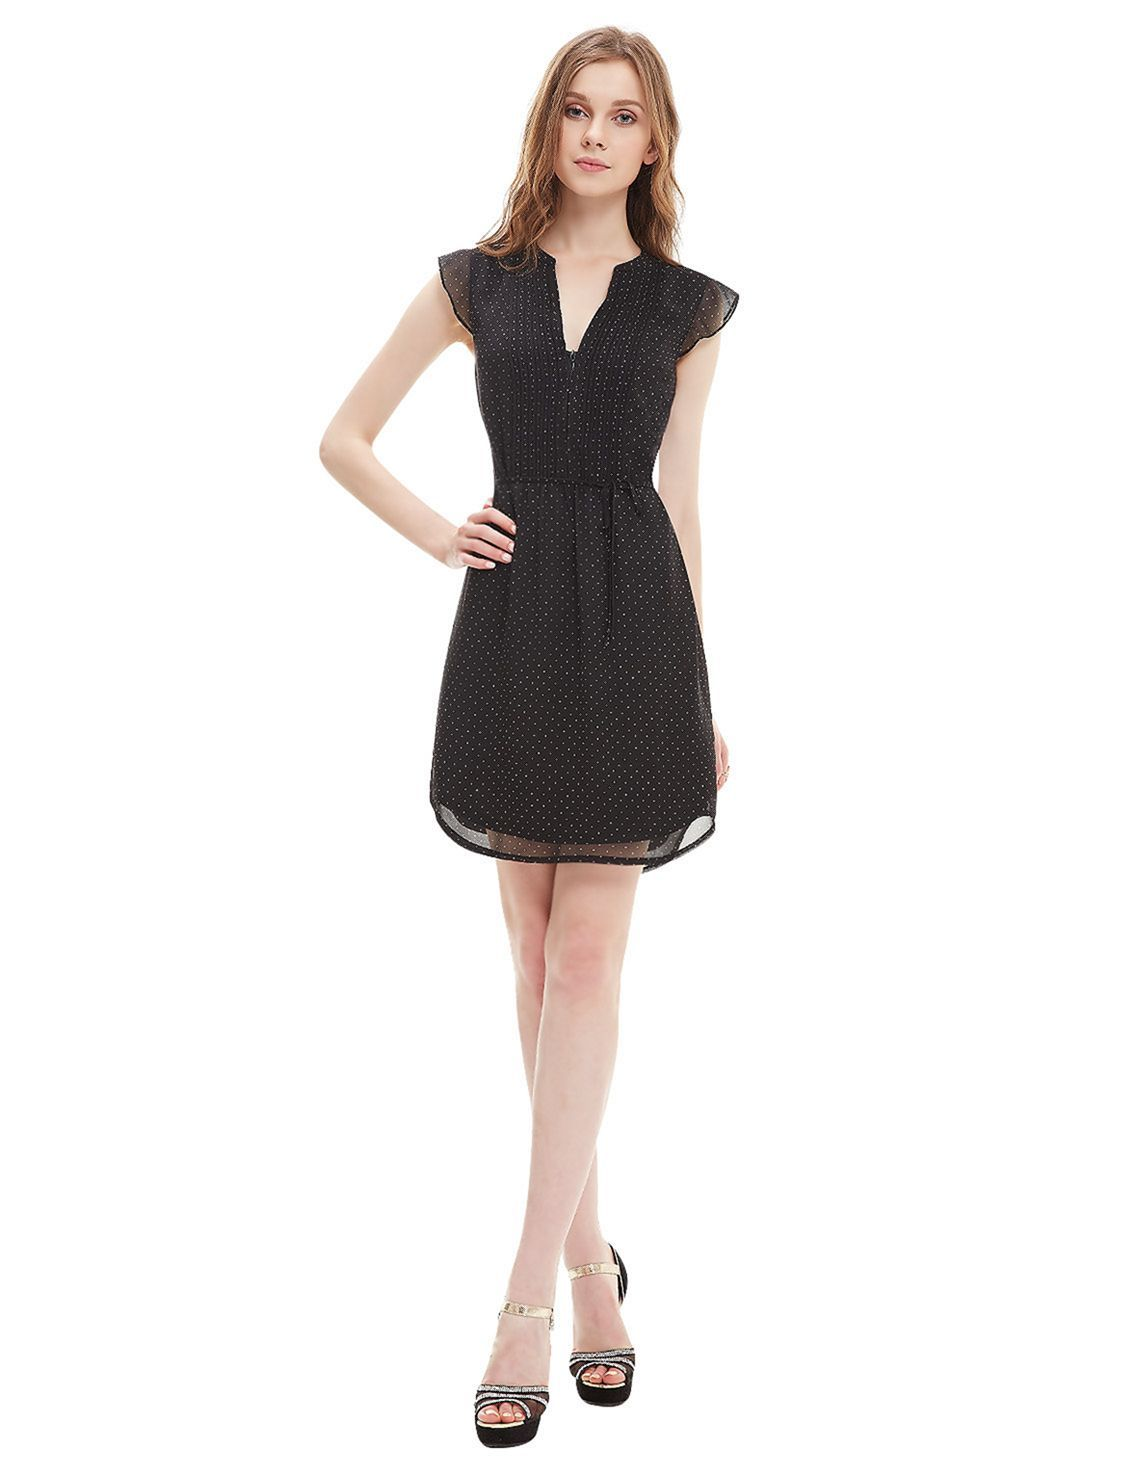 15 Gorgeous Sweetheart Neckline Summer Dresses For Bride Looks More Pretty Black Short Dress Short Cocktail Dress Black Short Sleeve Dress [ 1460 x 1125 Pixel ]